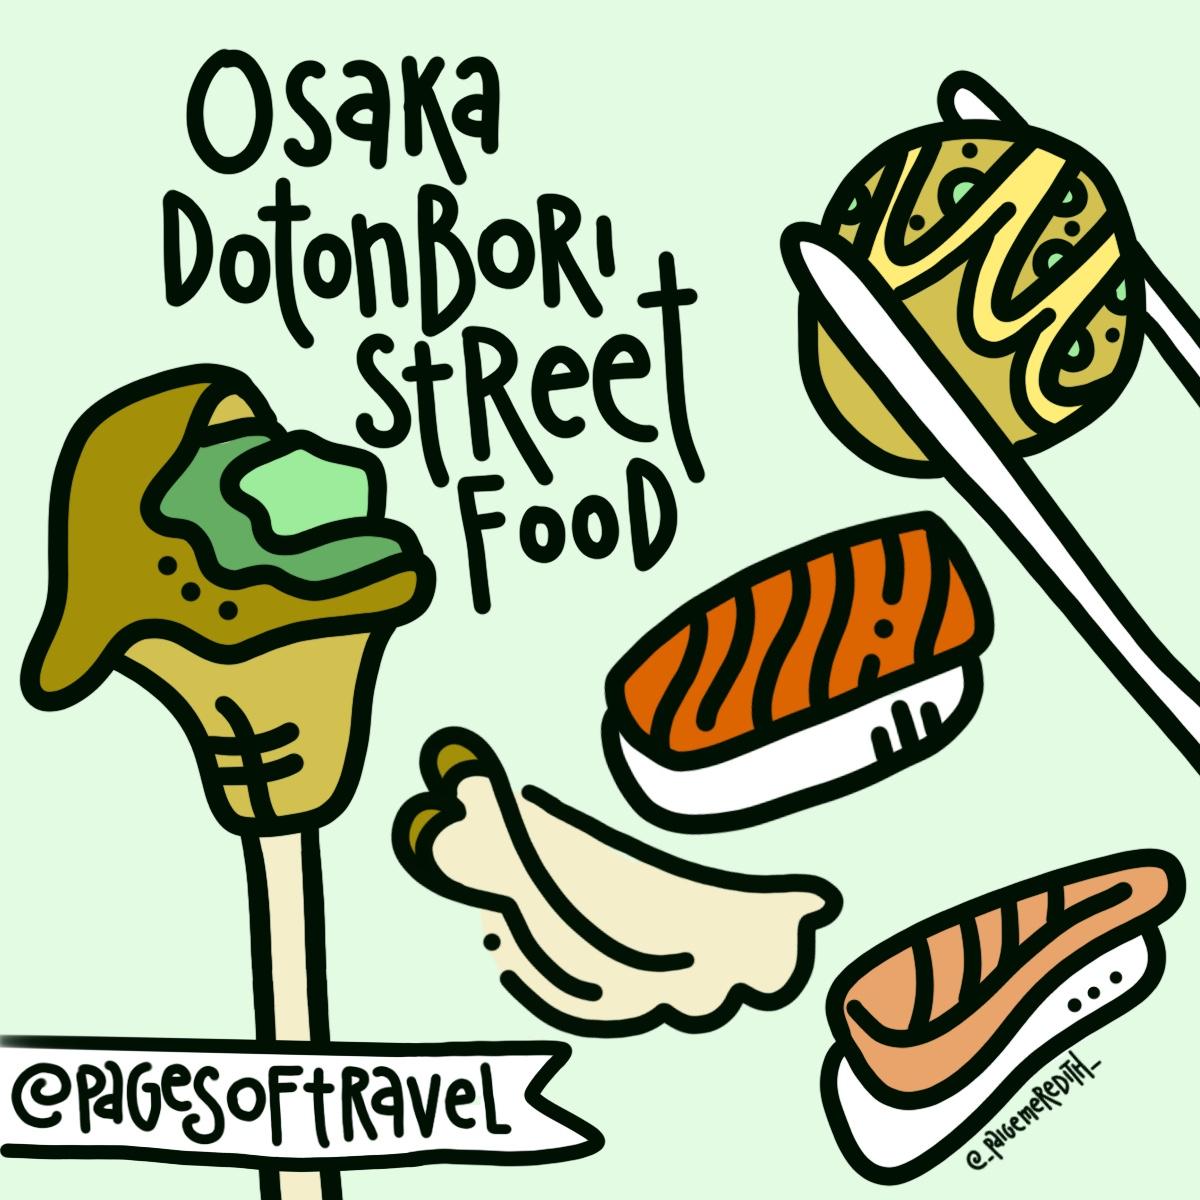 Donburi street food.jpg